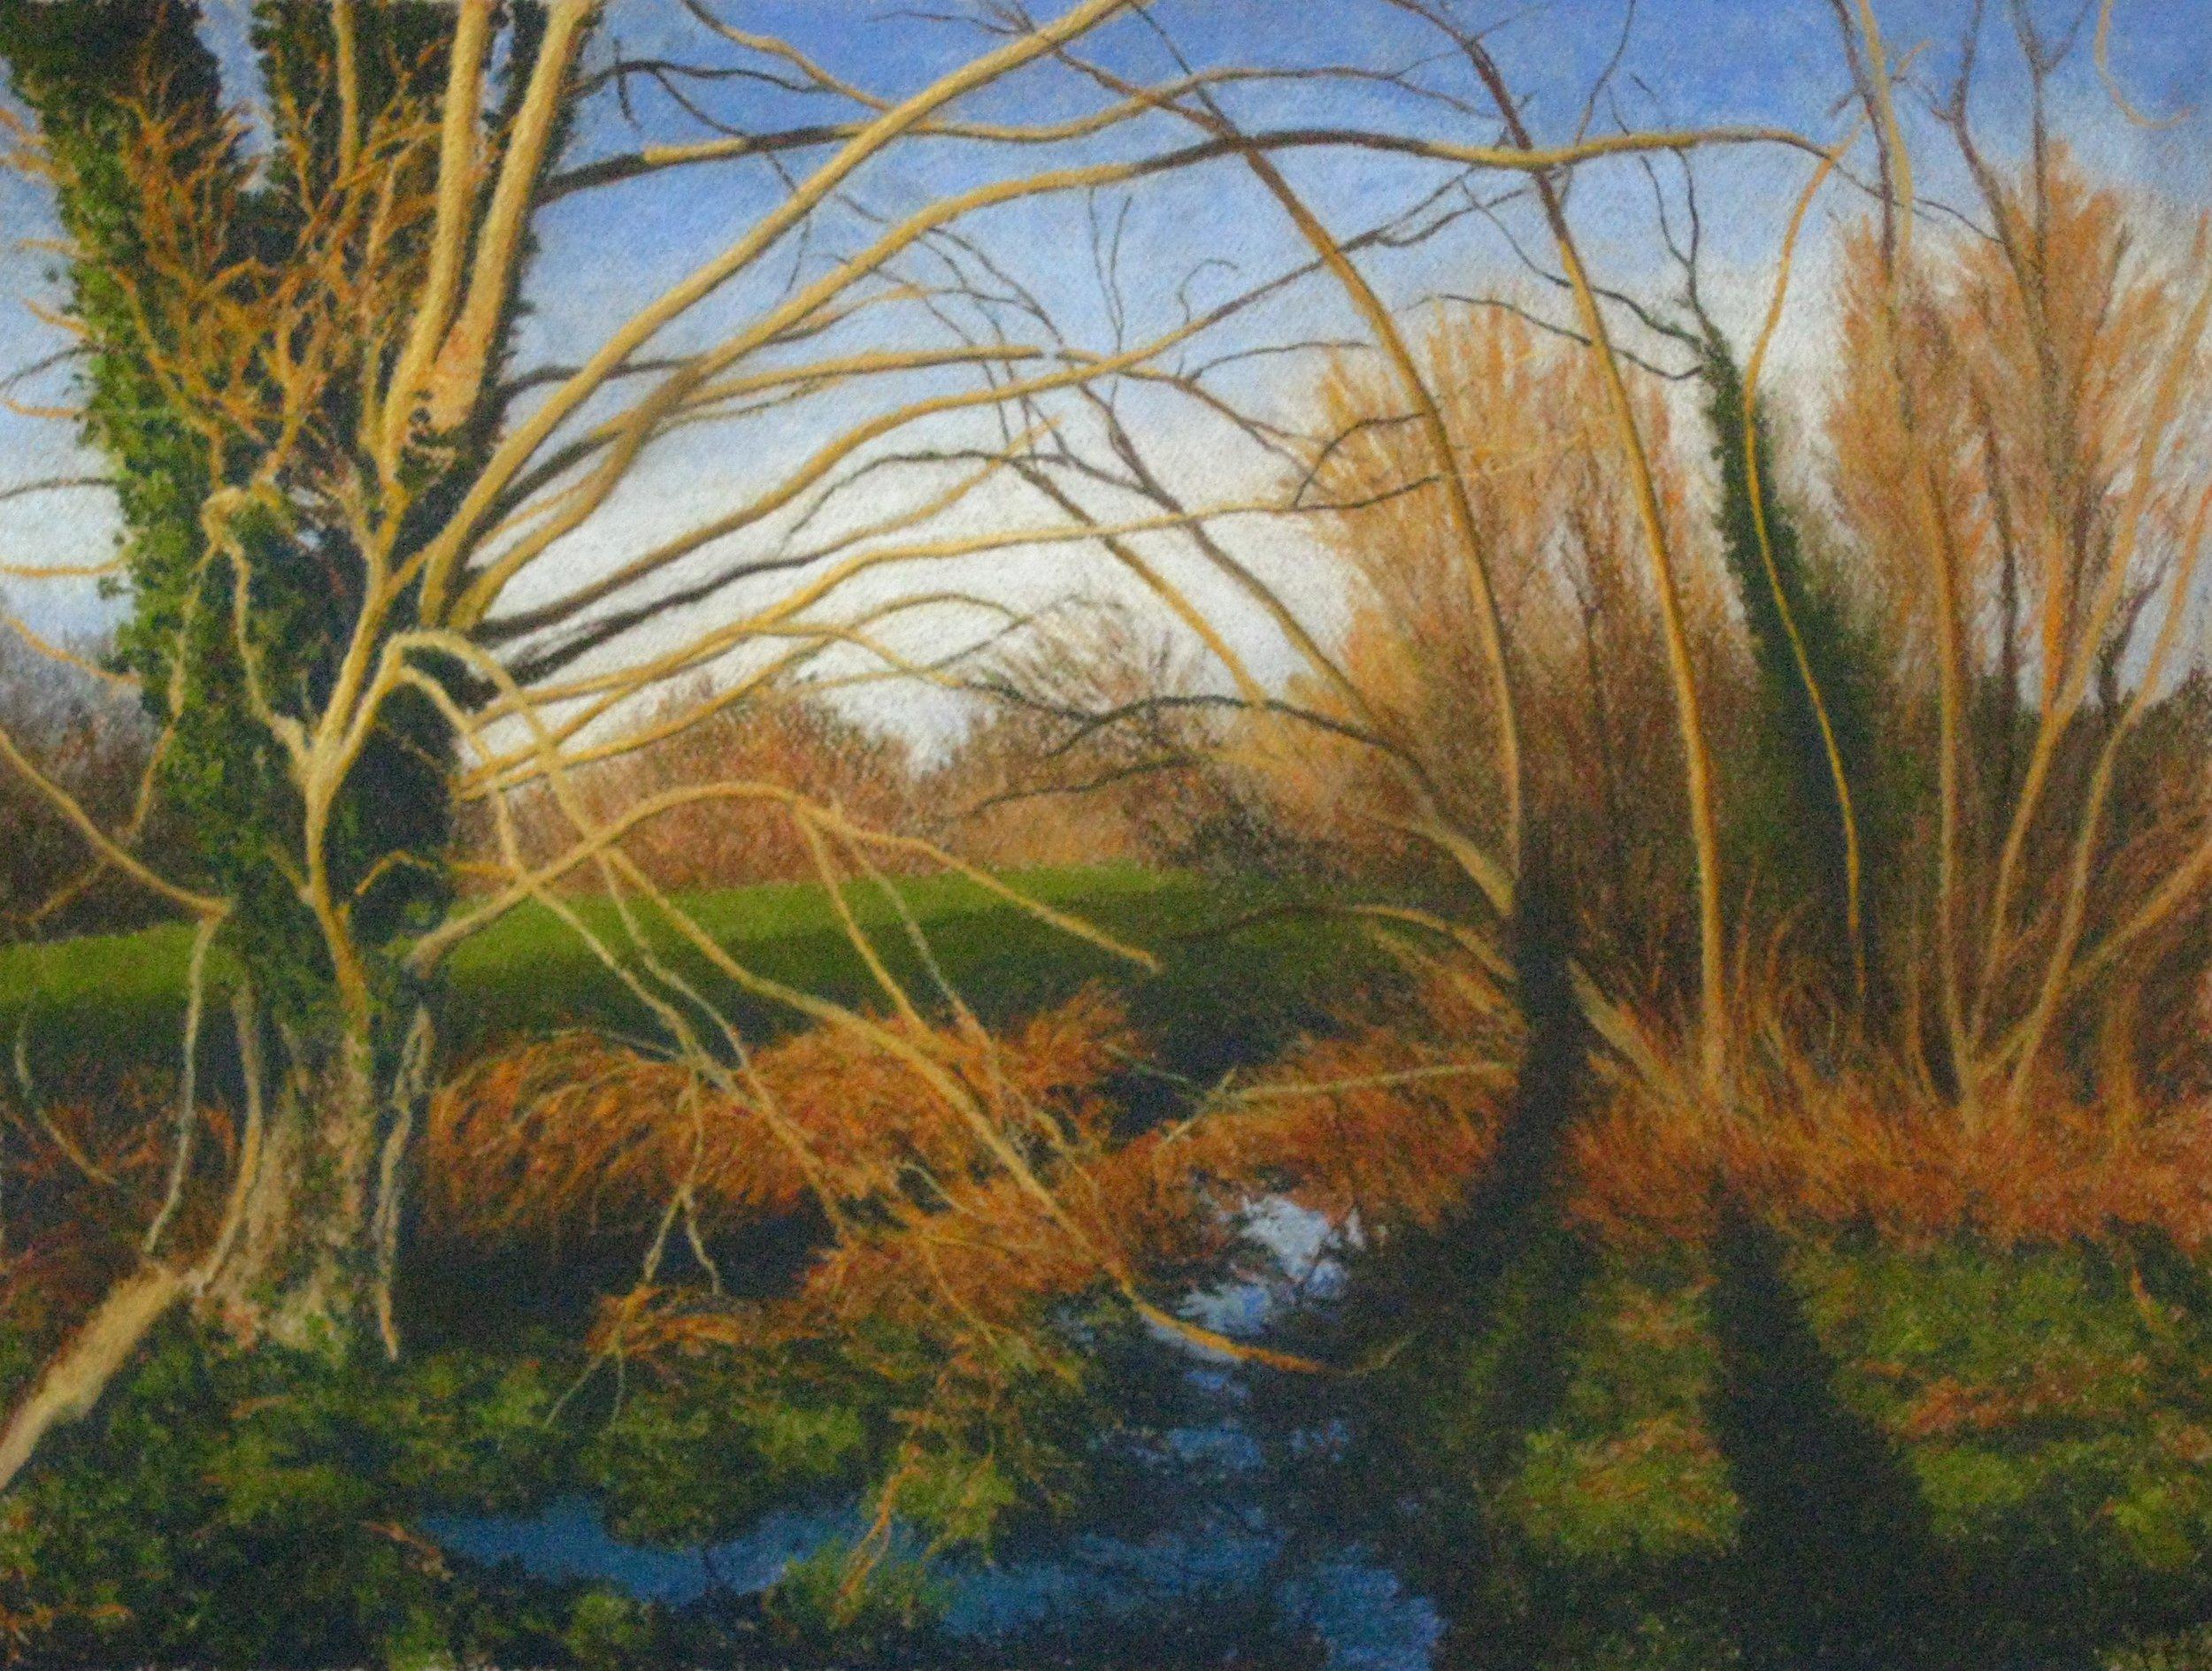 flood trees2 Cray Meadows 12 13.jpg